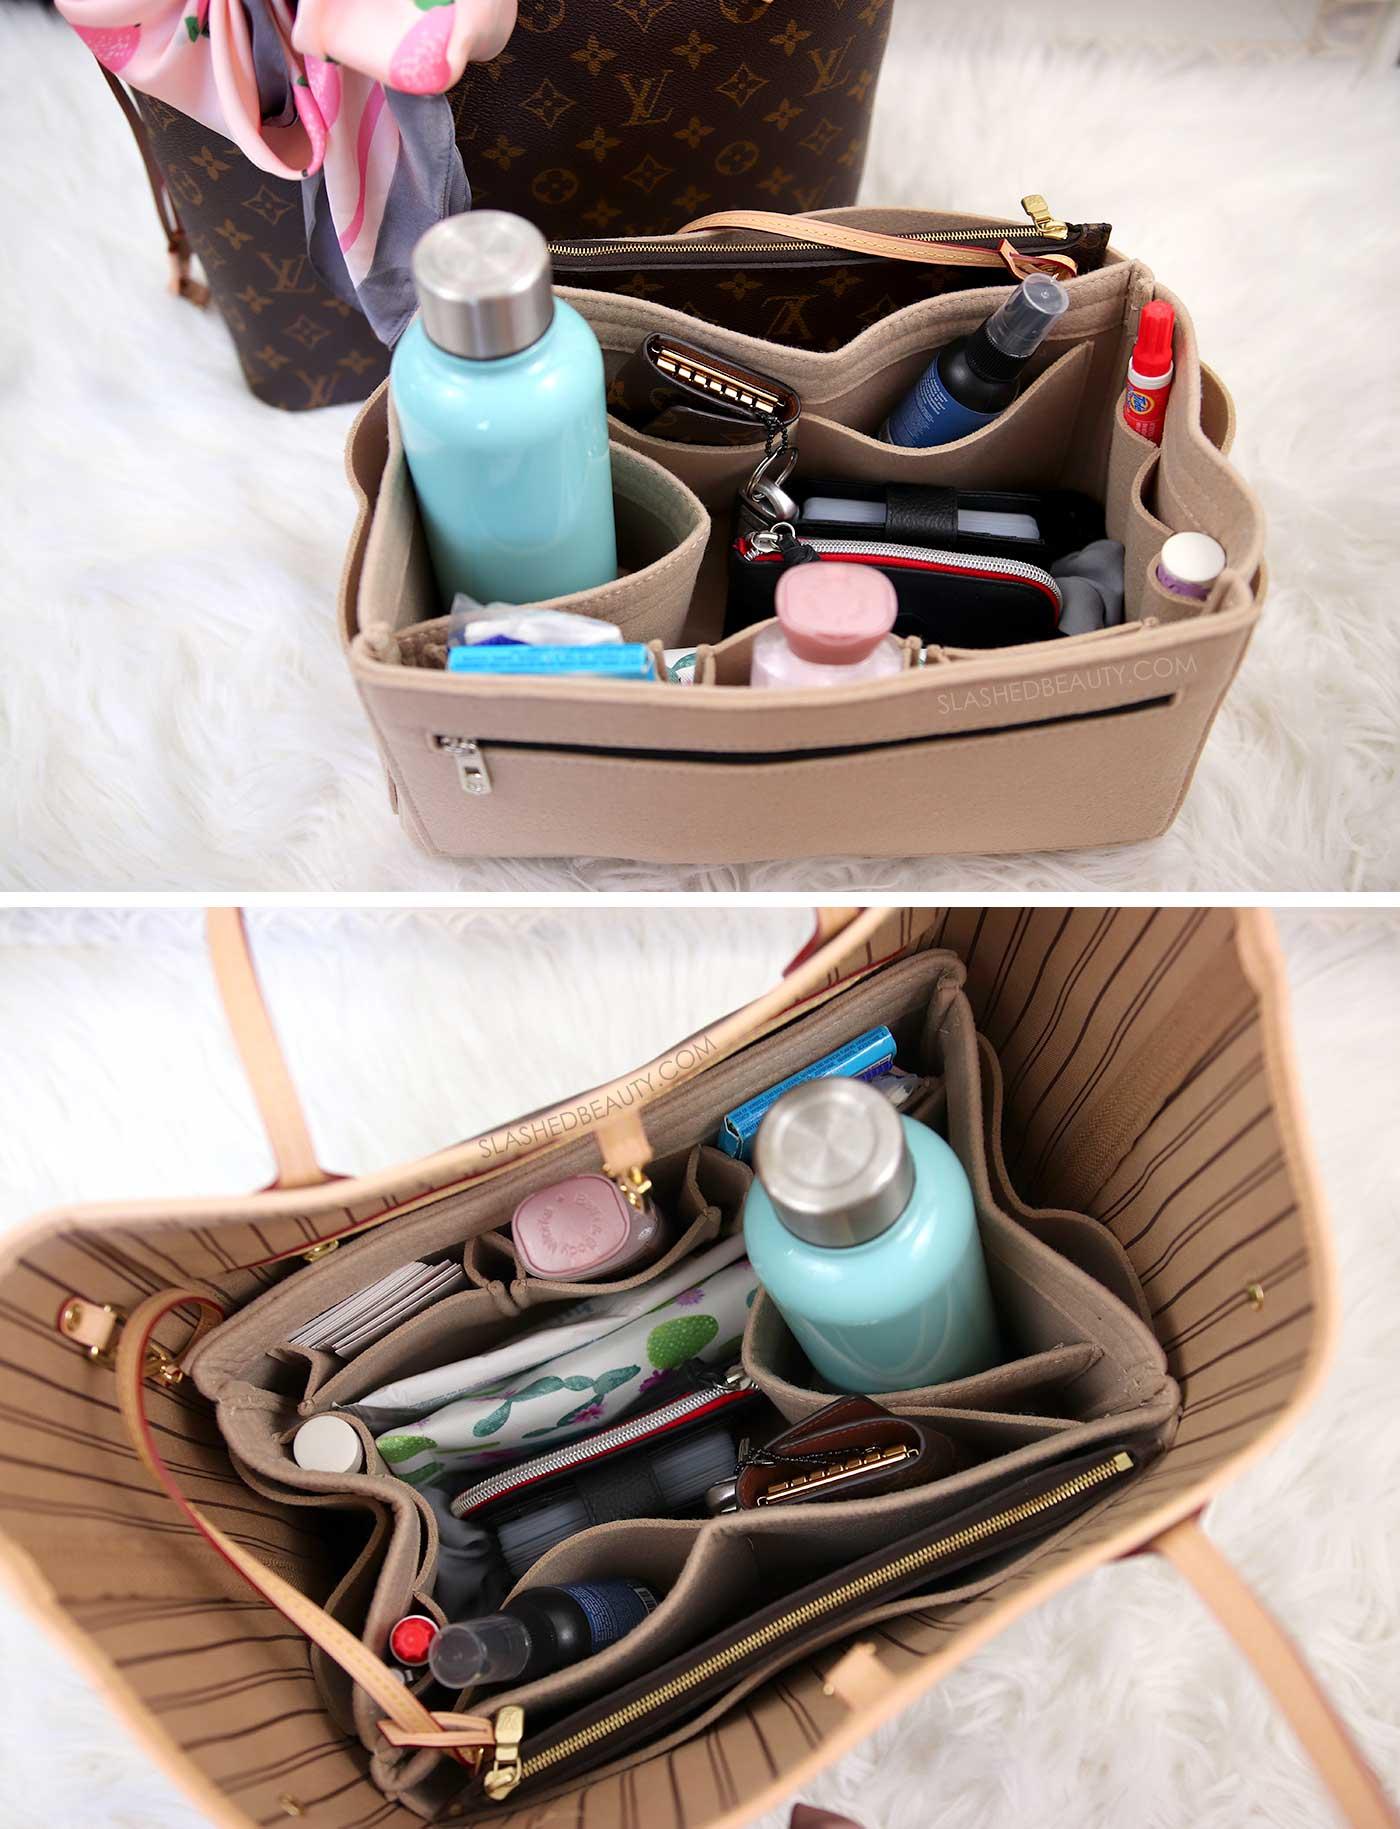 Best Handbag Organizer Insert for Louis Vuitton Neverfull | 5 Affordable Handbag Accessories for the Louis Vuitton Neverfull | Slashed Beauty